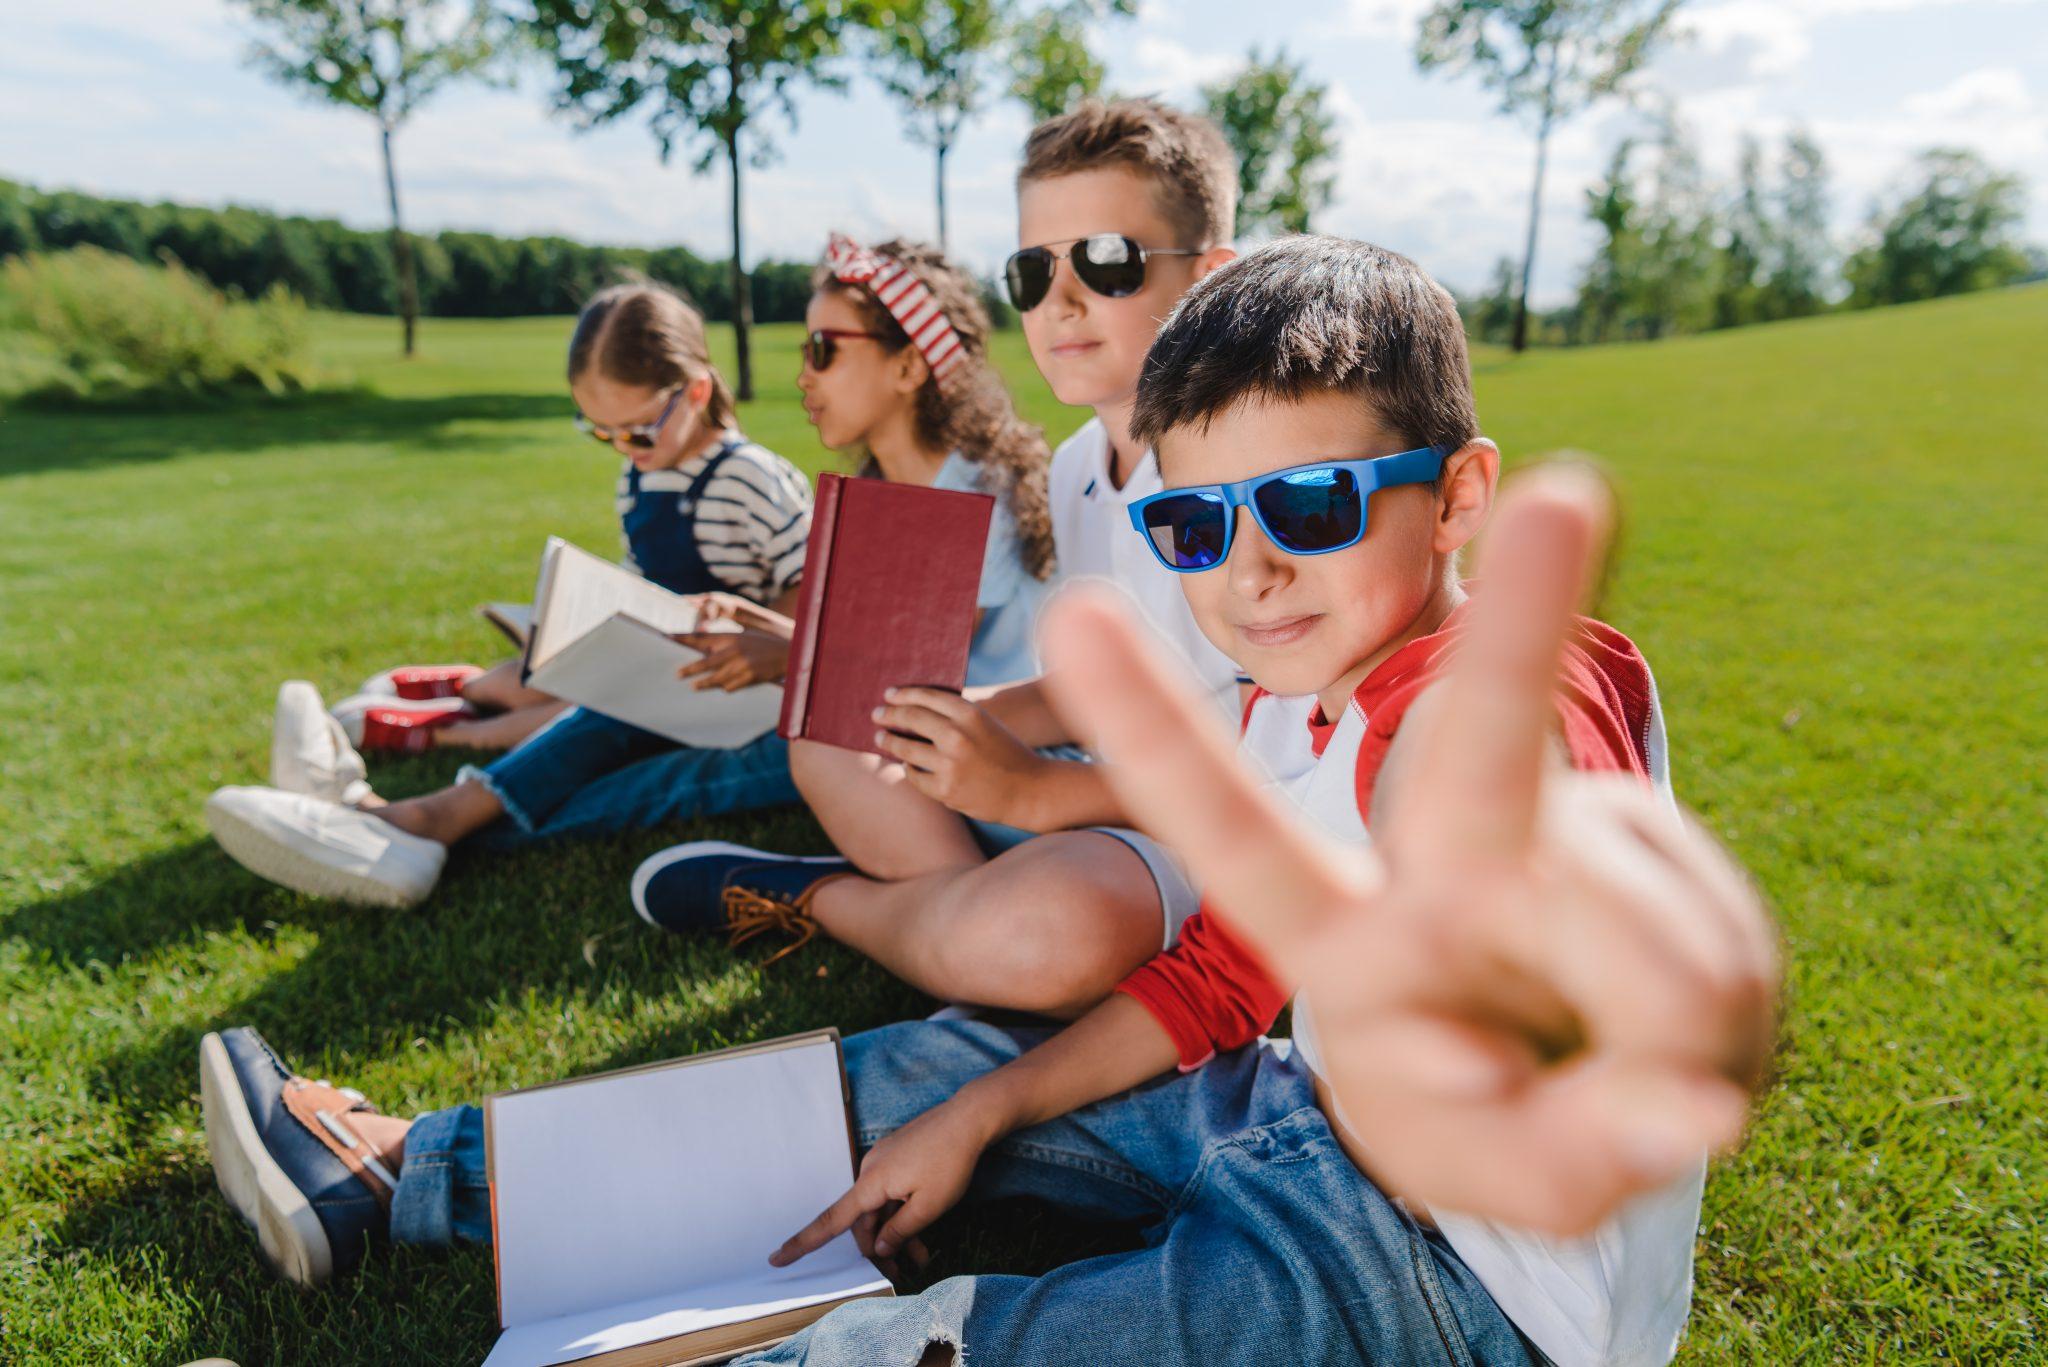 Should sunnies be part of the school uniform?